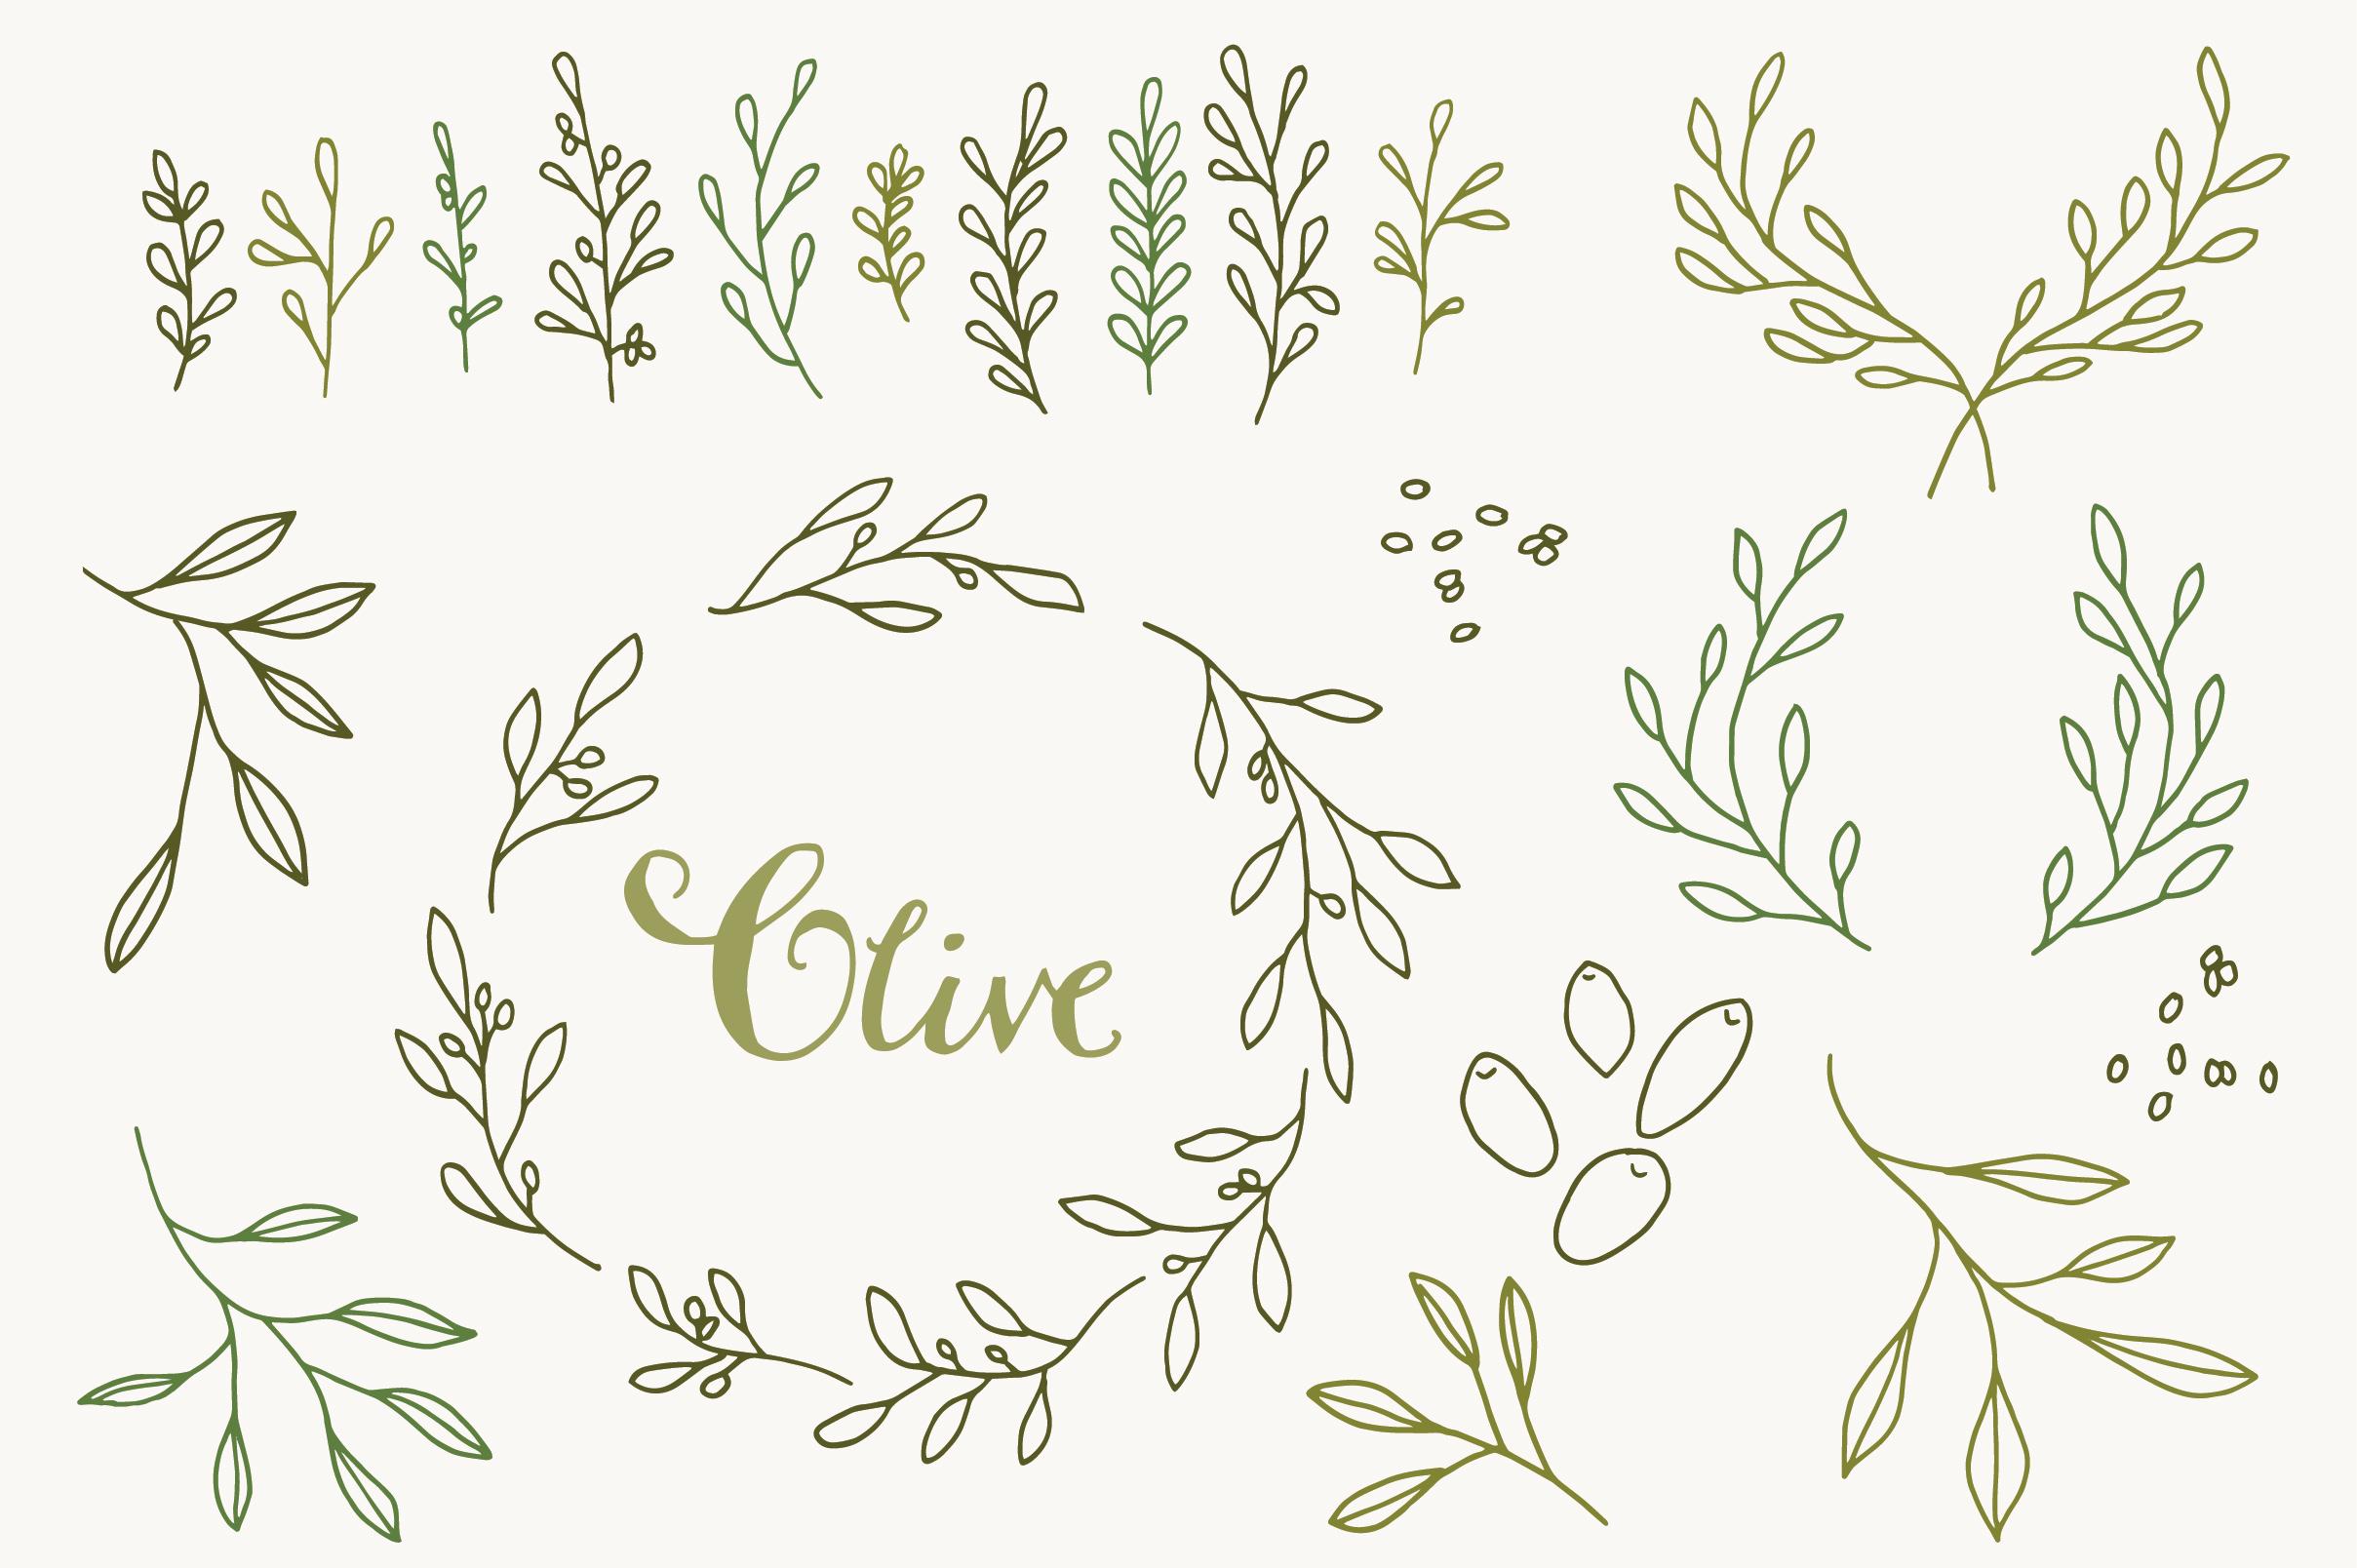 olive branch clip art   vectors   graphics on creative market olive branch clip art images olive branch clip art images